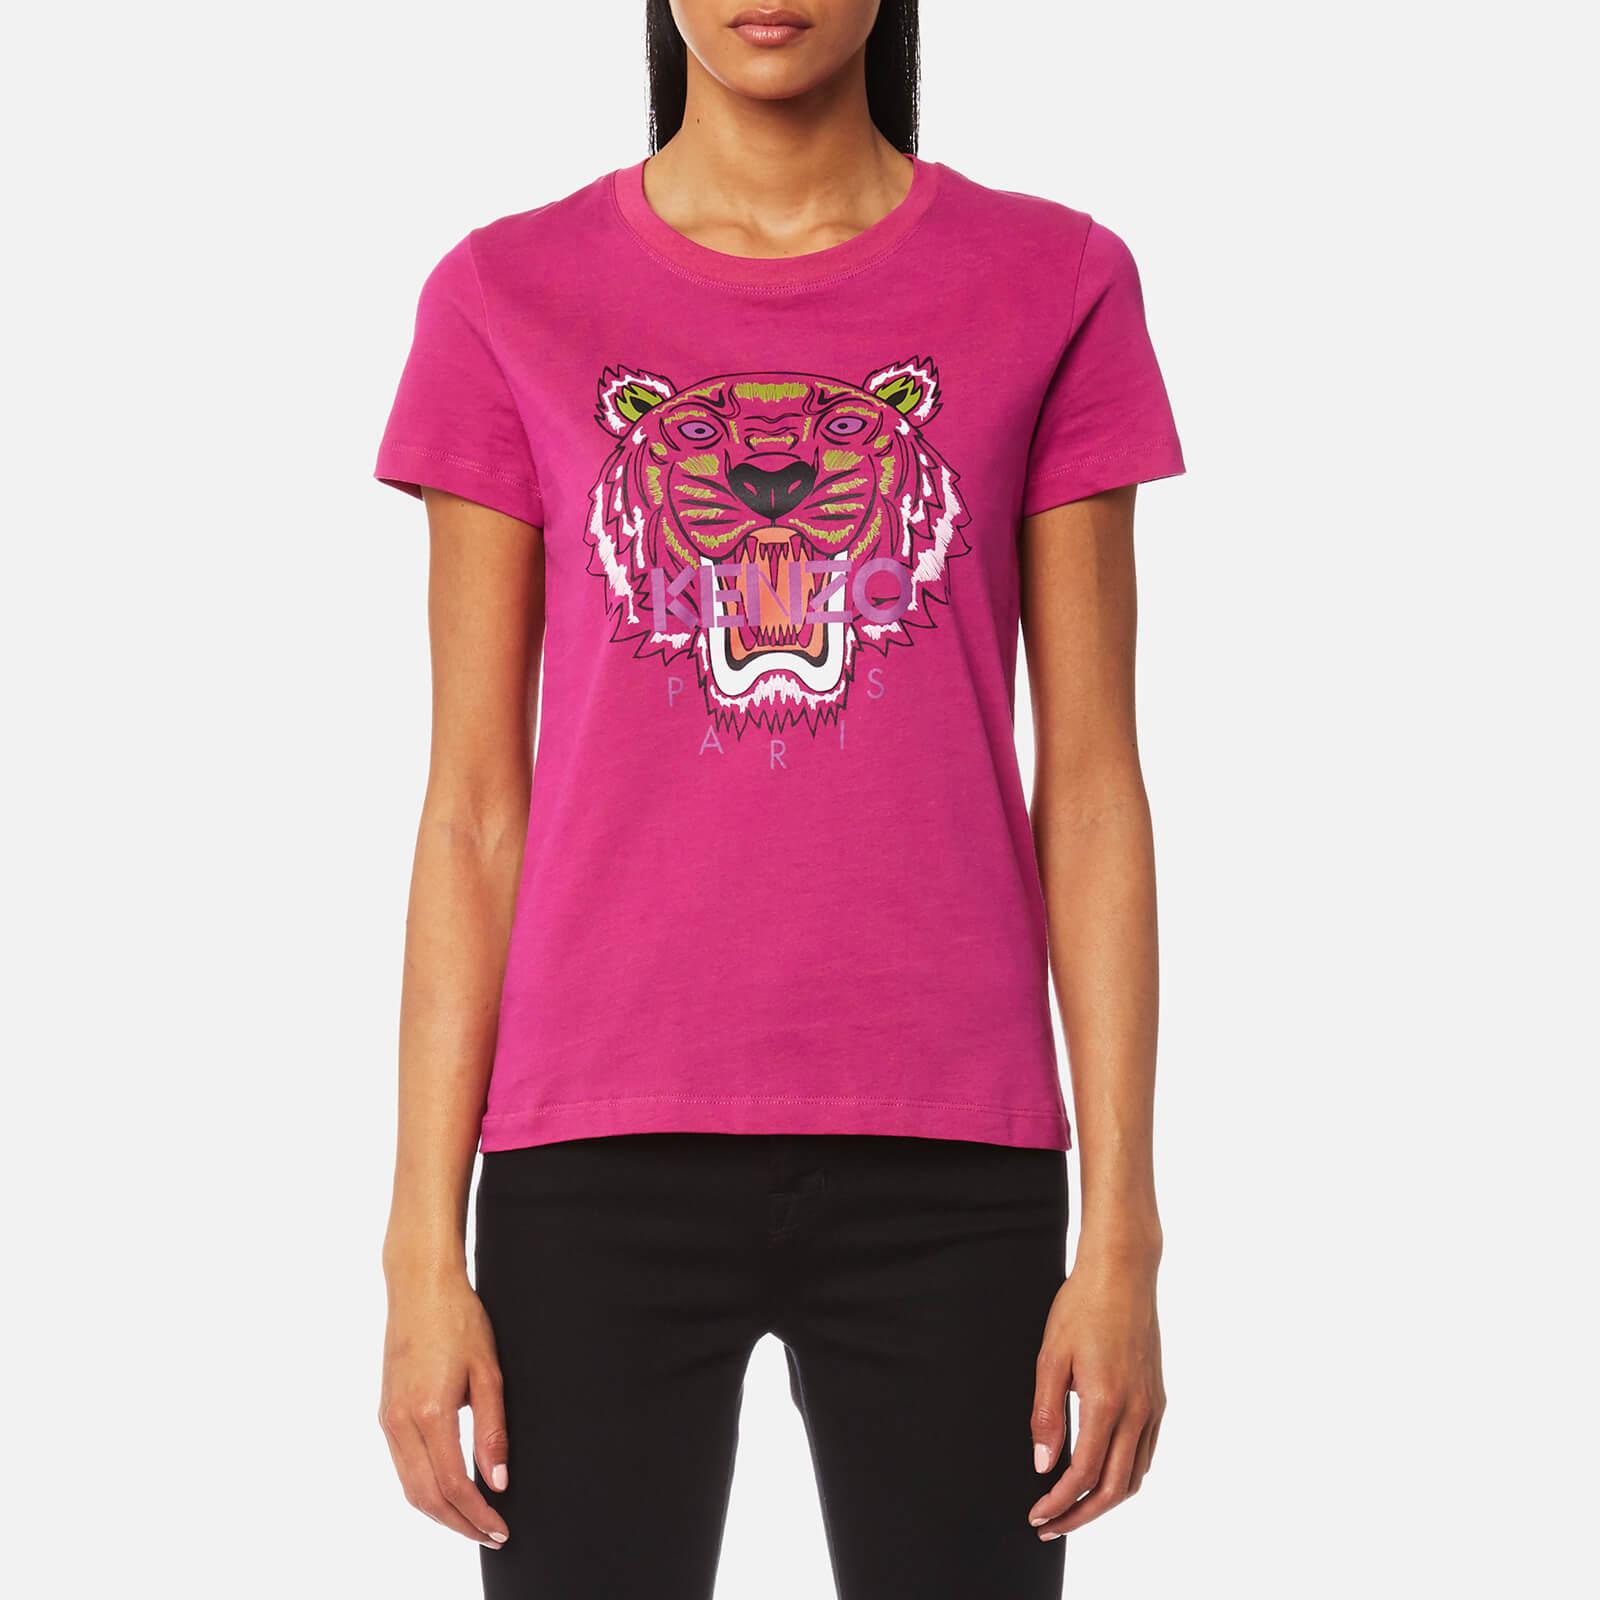 734d1b88353c KENZO Women's Tiger Classic T-Shirt - Deep Fuchsia - Free UK Delivery over £ 50